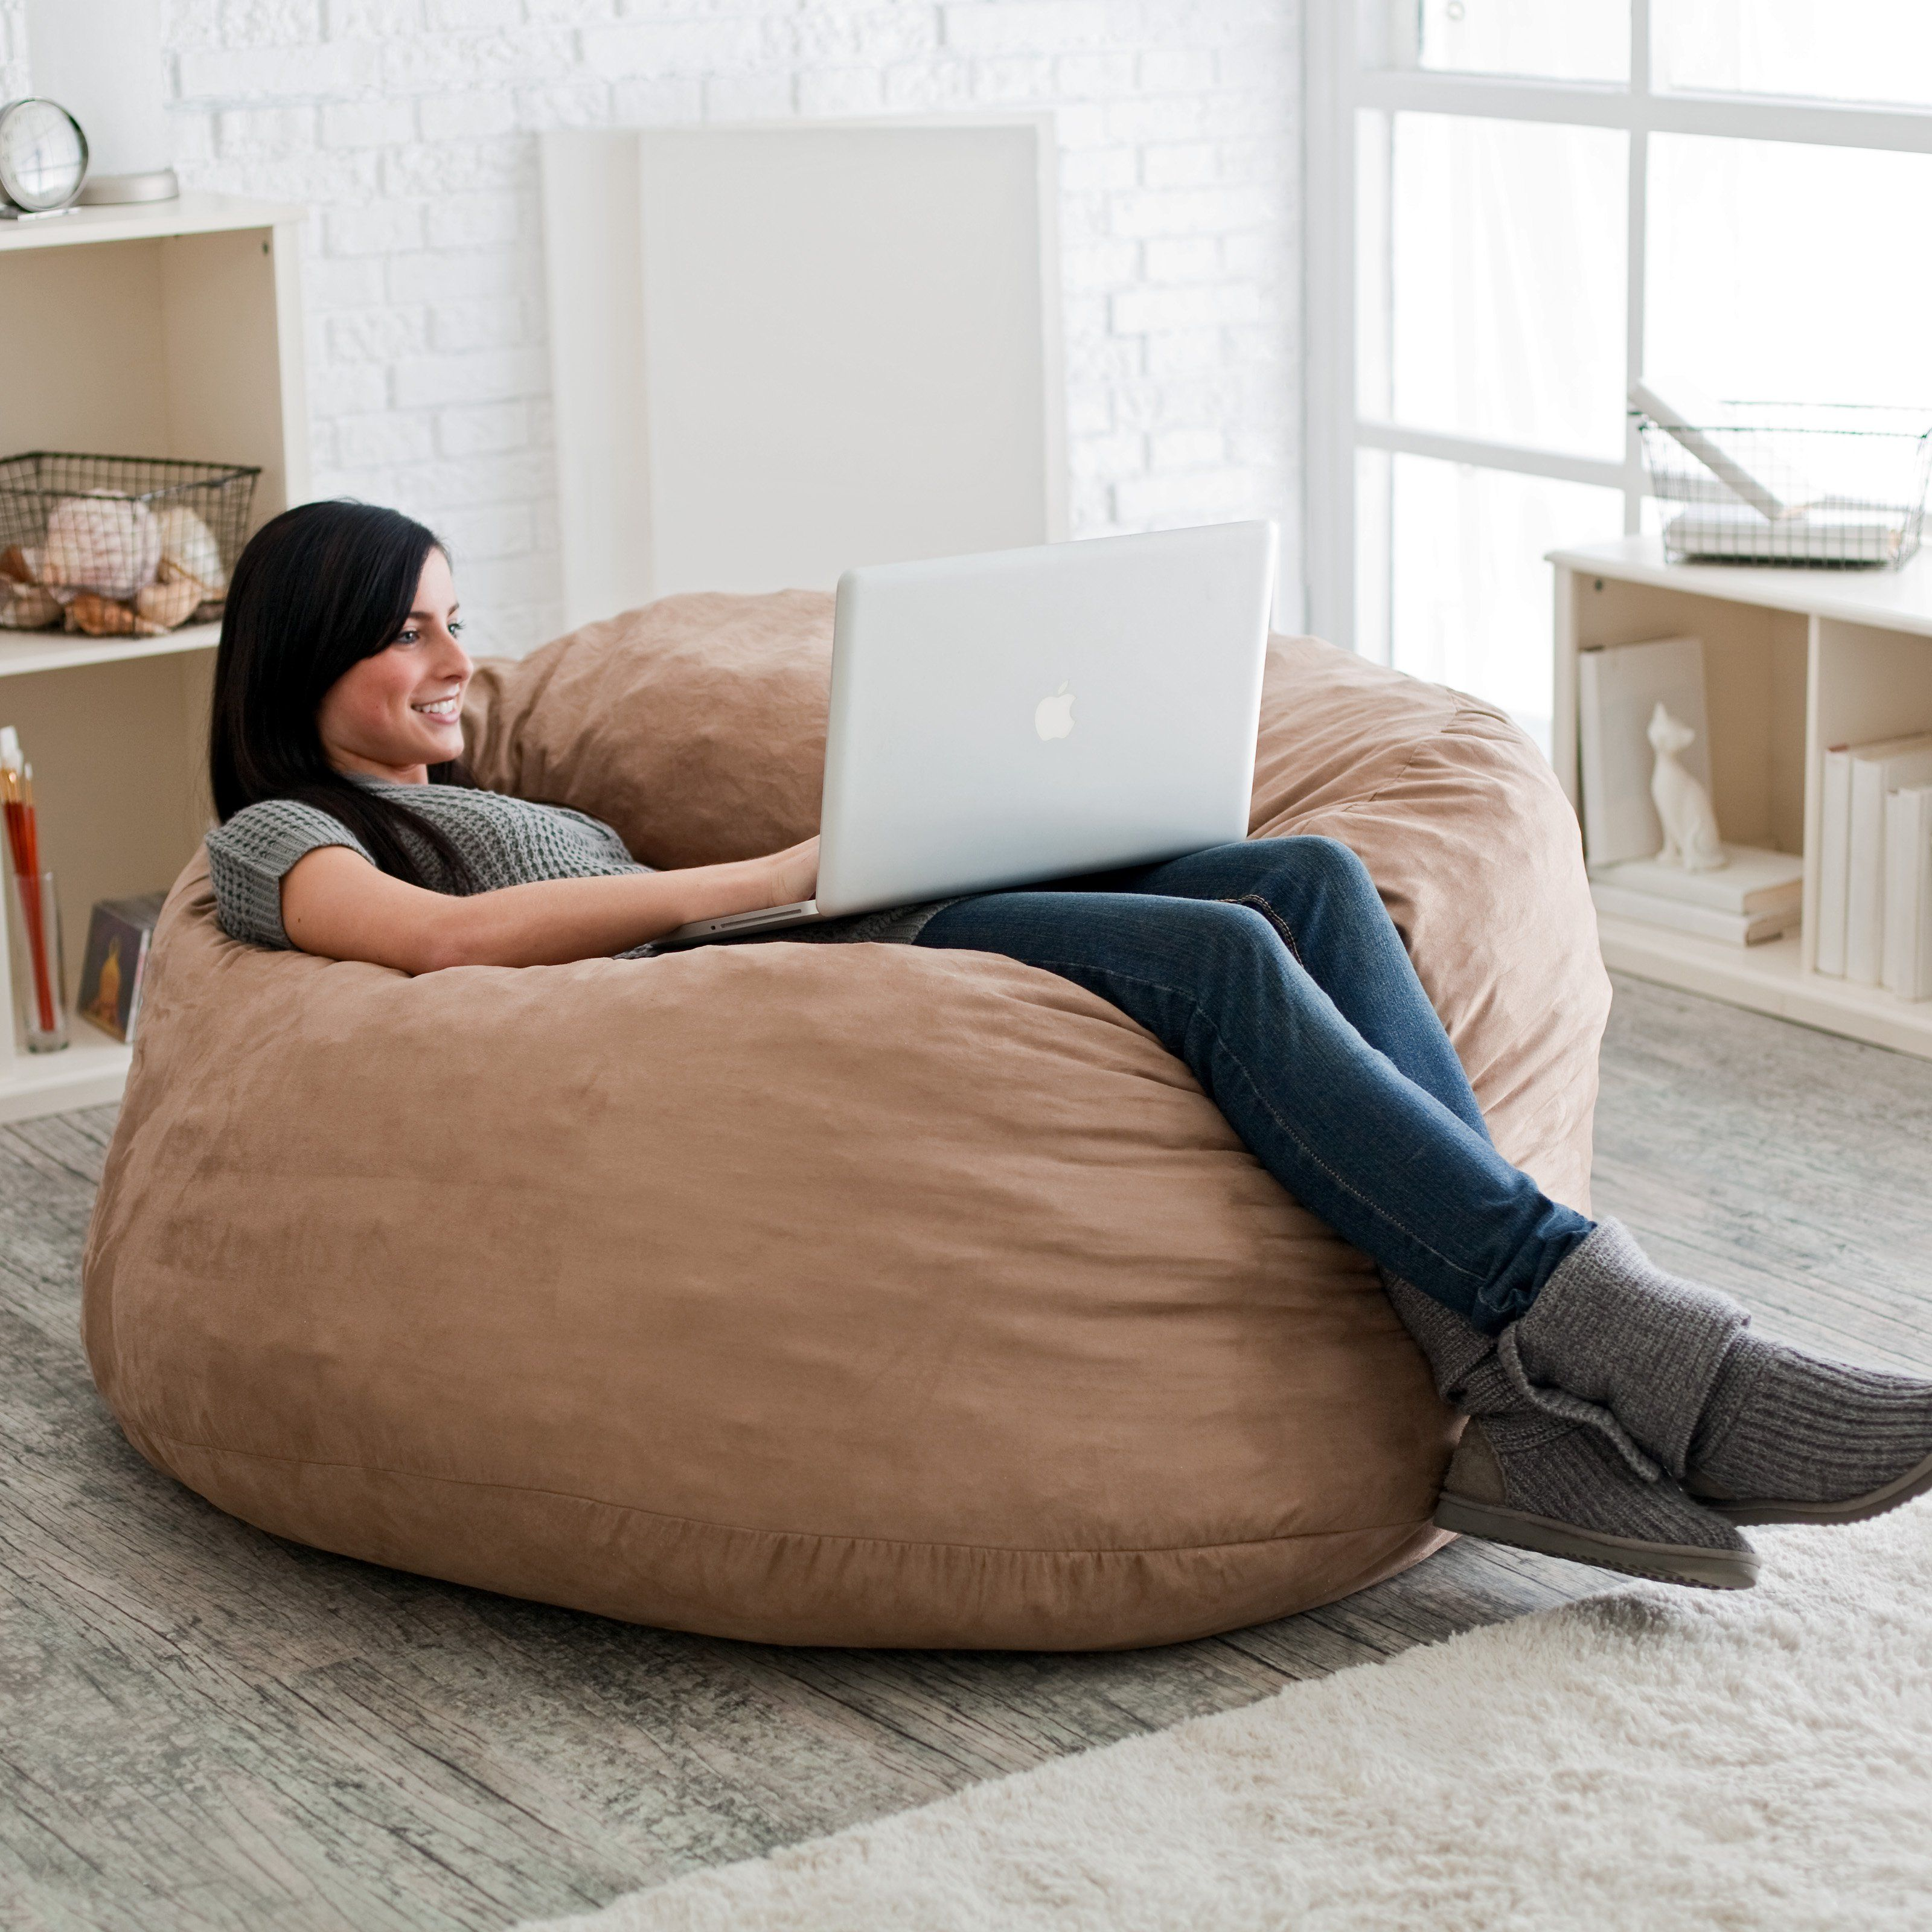 FUF 4 ft Micro Suede Bean Bag Sofa